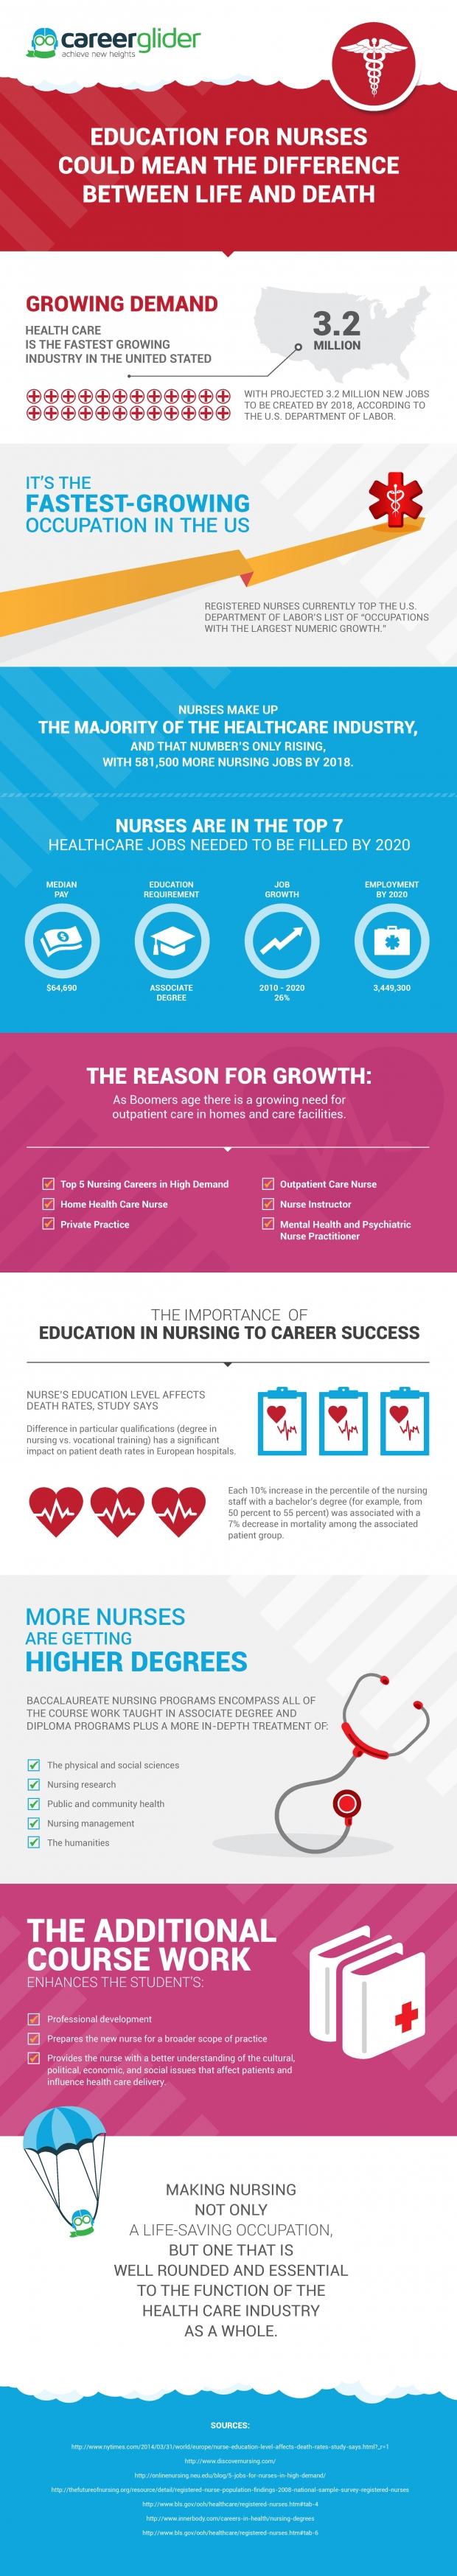 CareerGlider_Nursing_Infographic_ak_v1-page-001